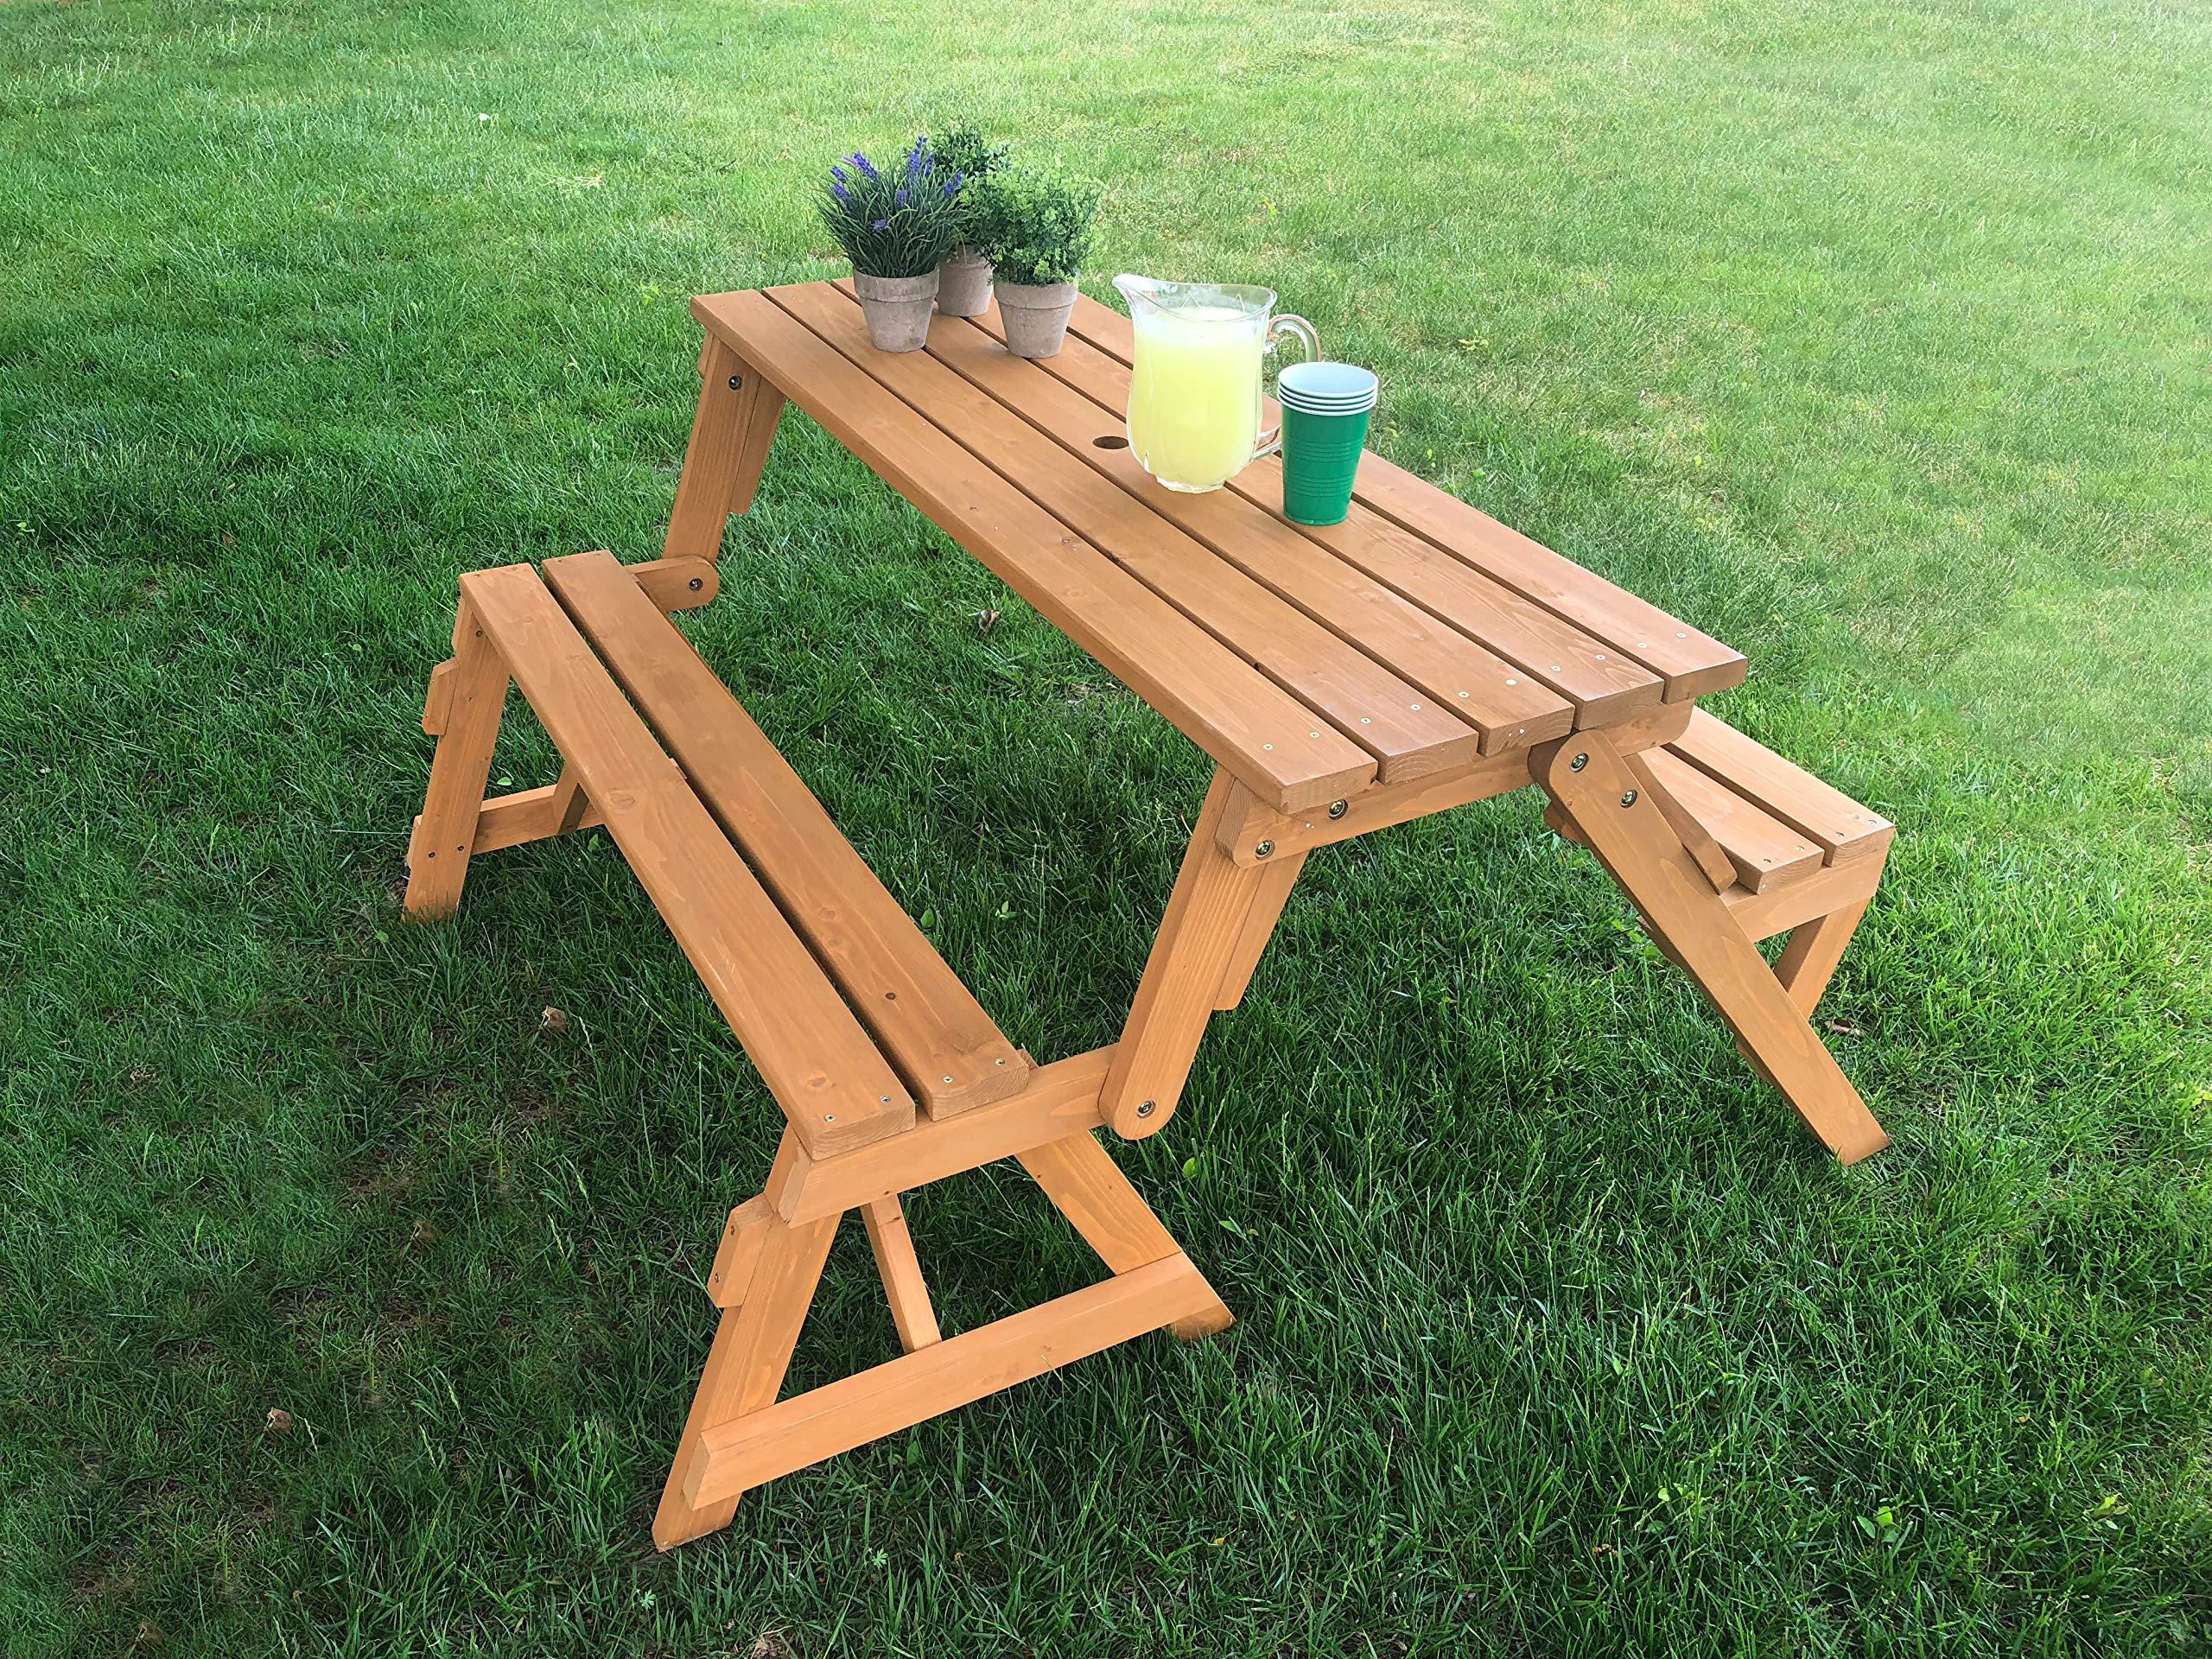 Tierra Garden 2-in-1 Convertible Junior Picnic Table/Bench by Tierra Garden (Image #3)